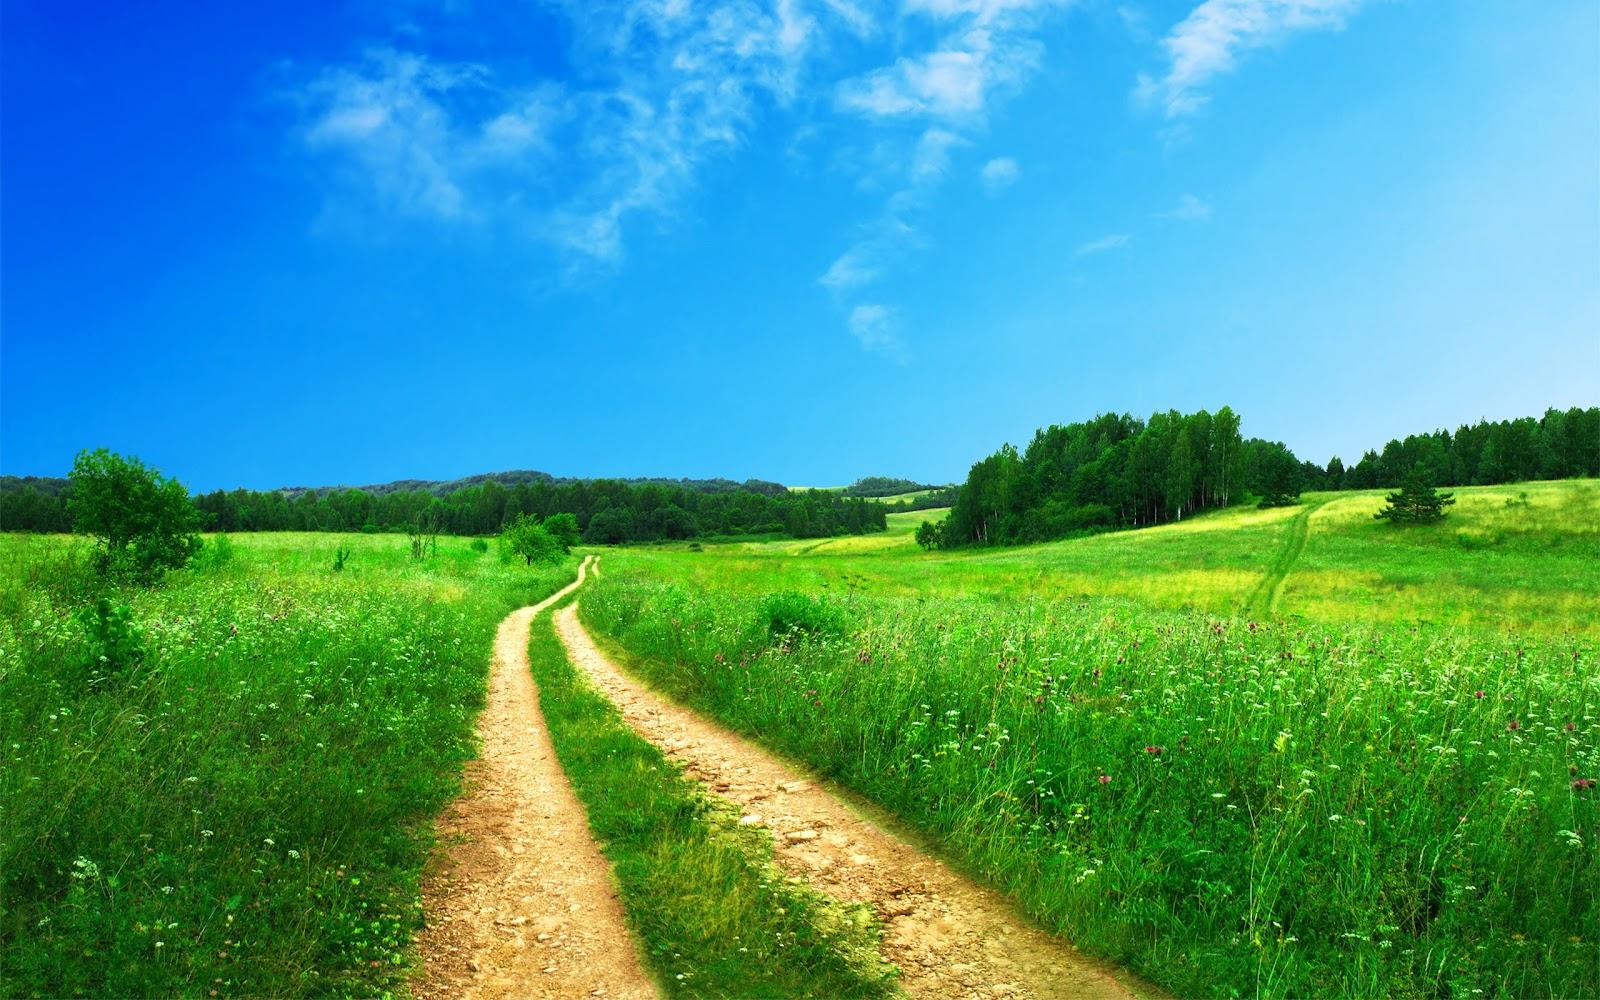 http://4.bp.blogspot.com/-lwsEheLyRIc/T4mpn3QkV7I/AAAAAAAAABA/9qKguHiUHKI/s1600/new-hd-natur-roads-nature-walpaper-laptop-desktop.jpg